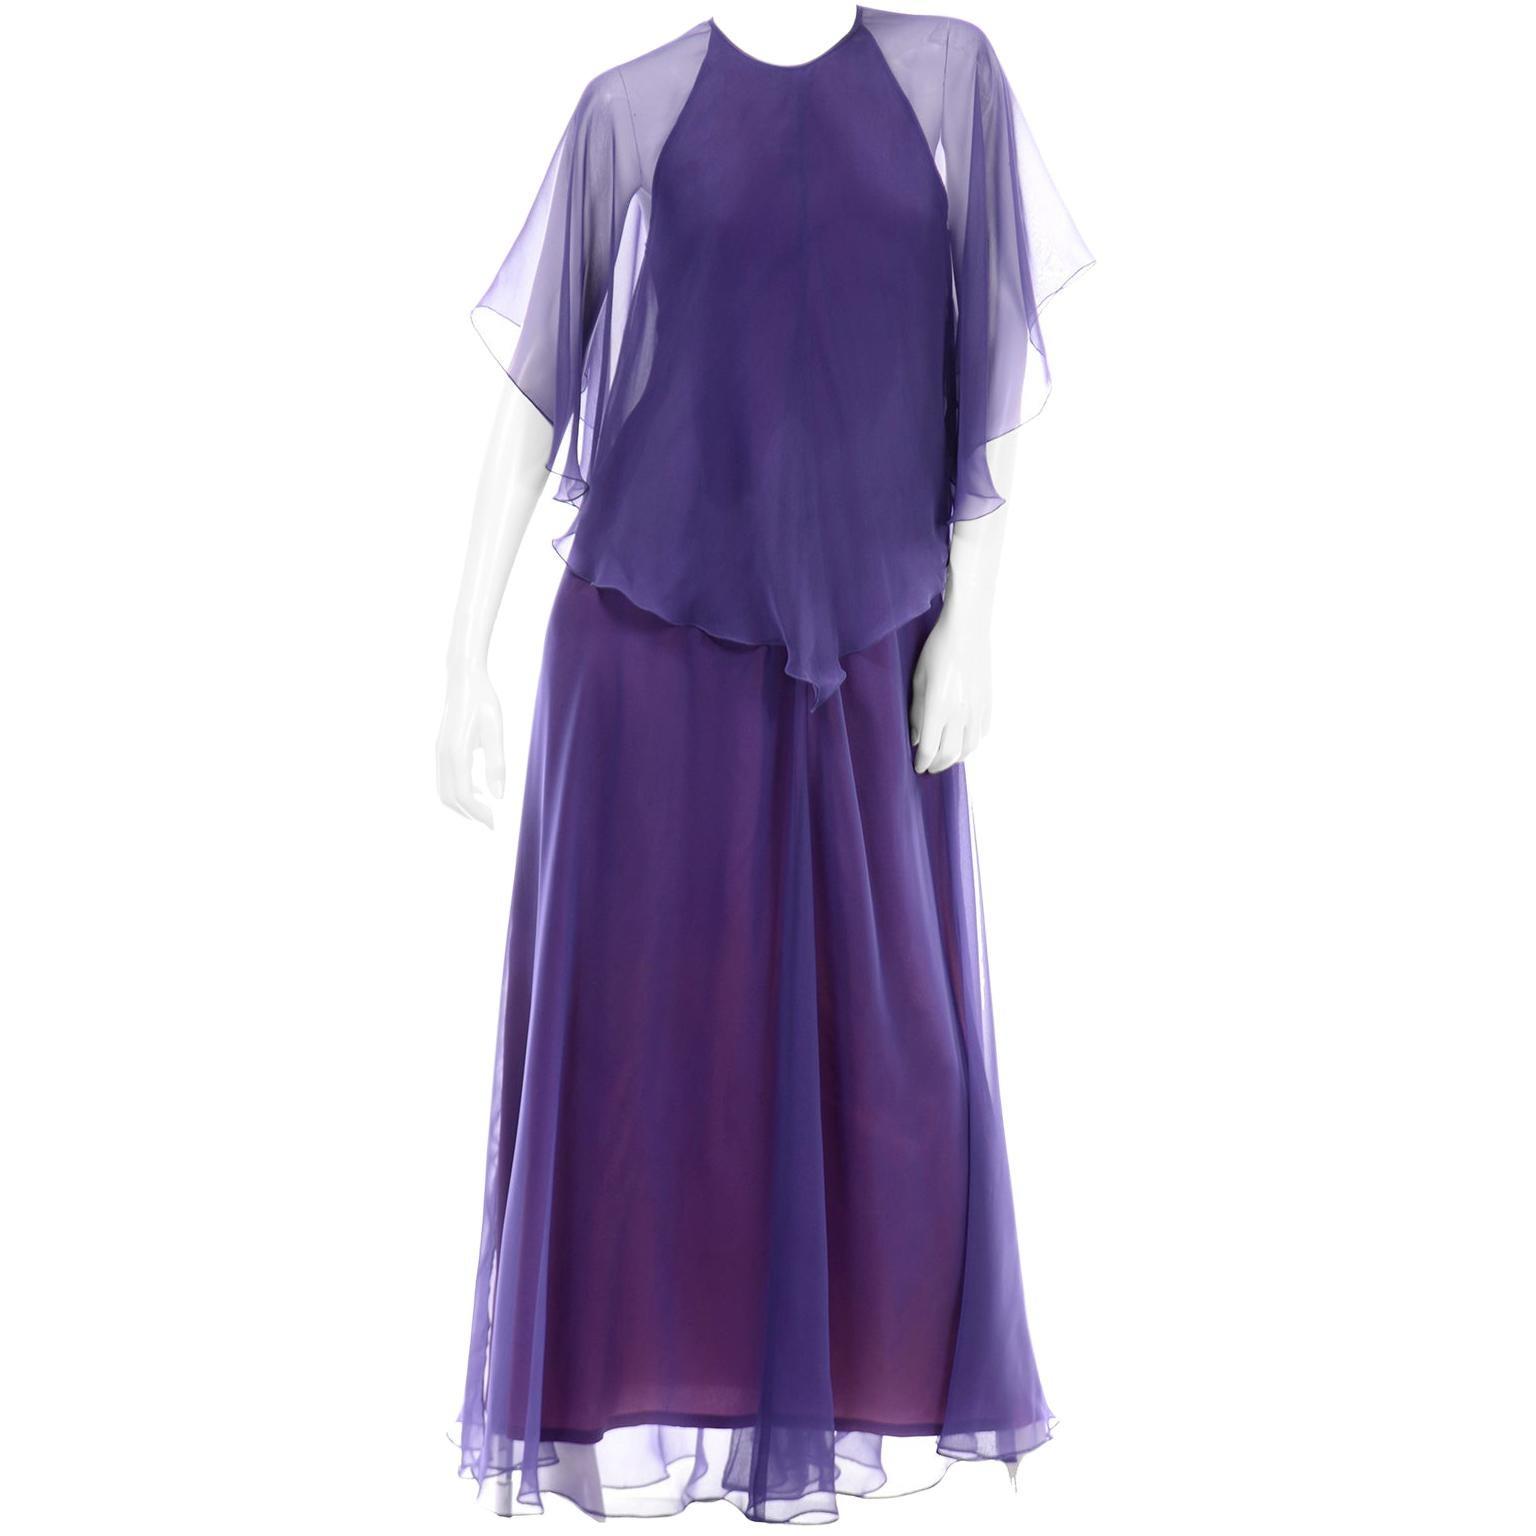 Jean Varon 1970s Vintage Blue Chiffon Evening Dress With Sheer Overlay